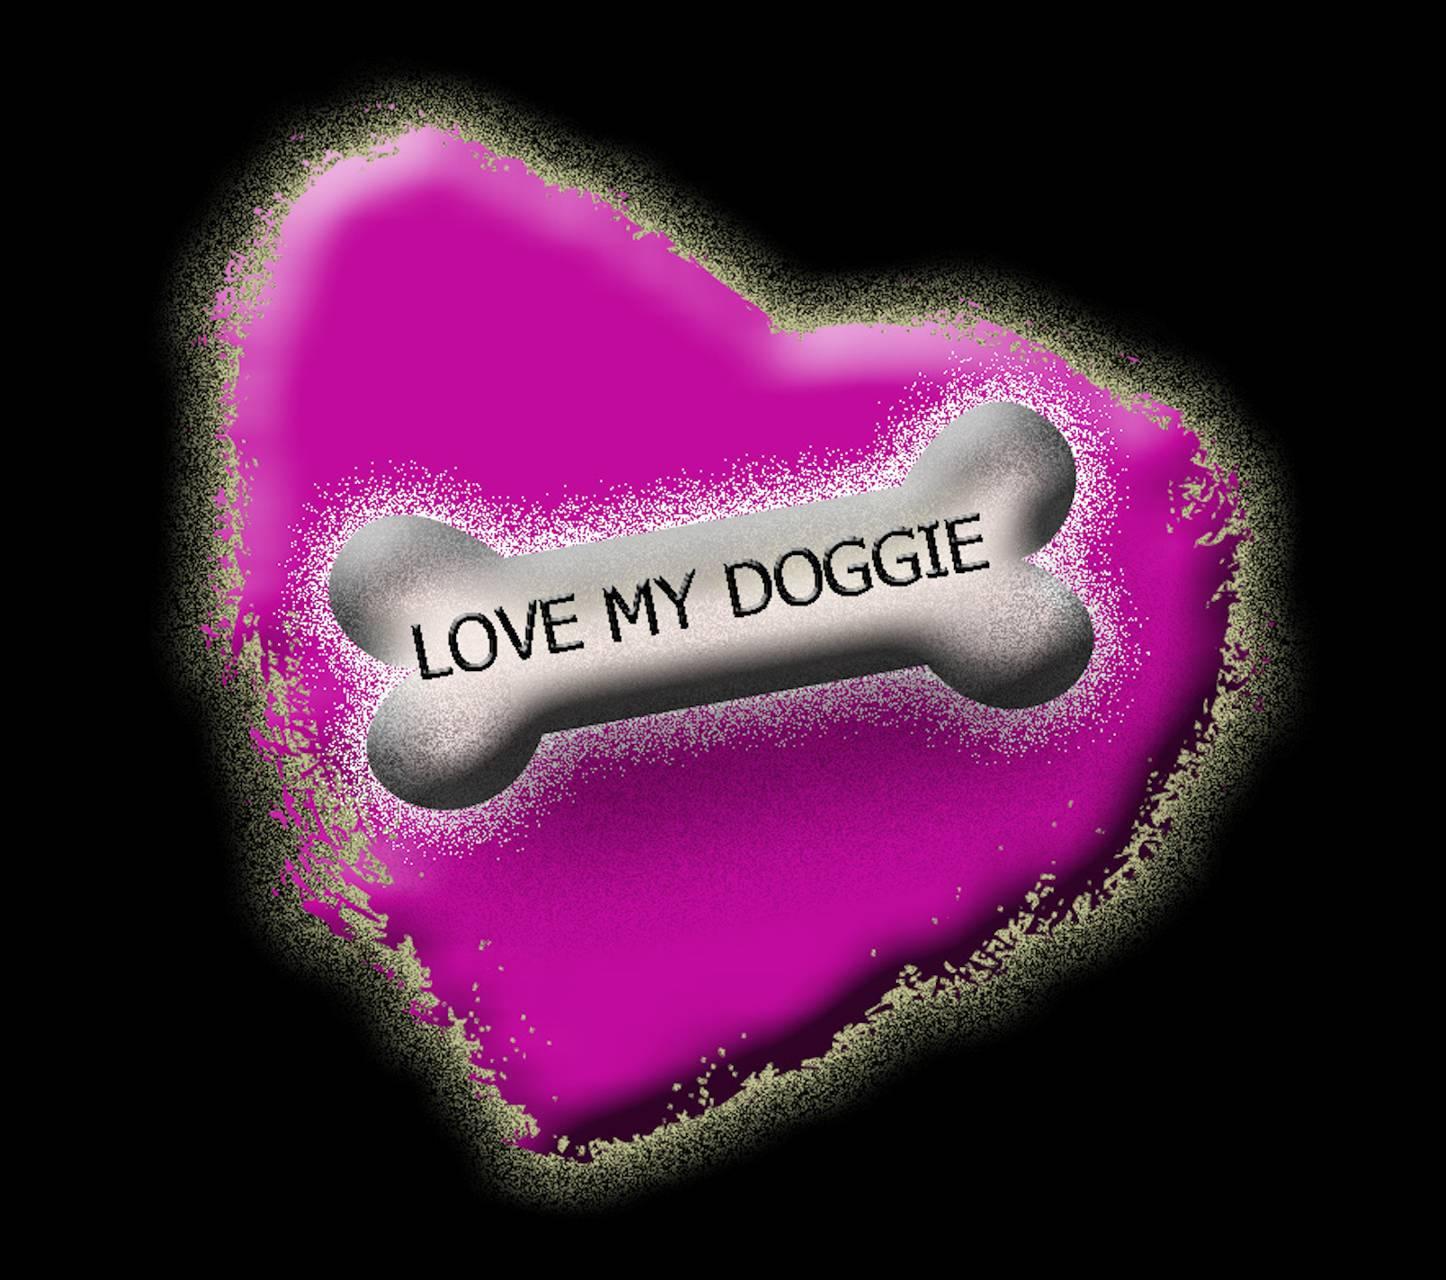 Love My Doggie